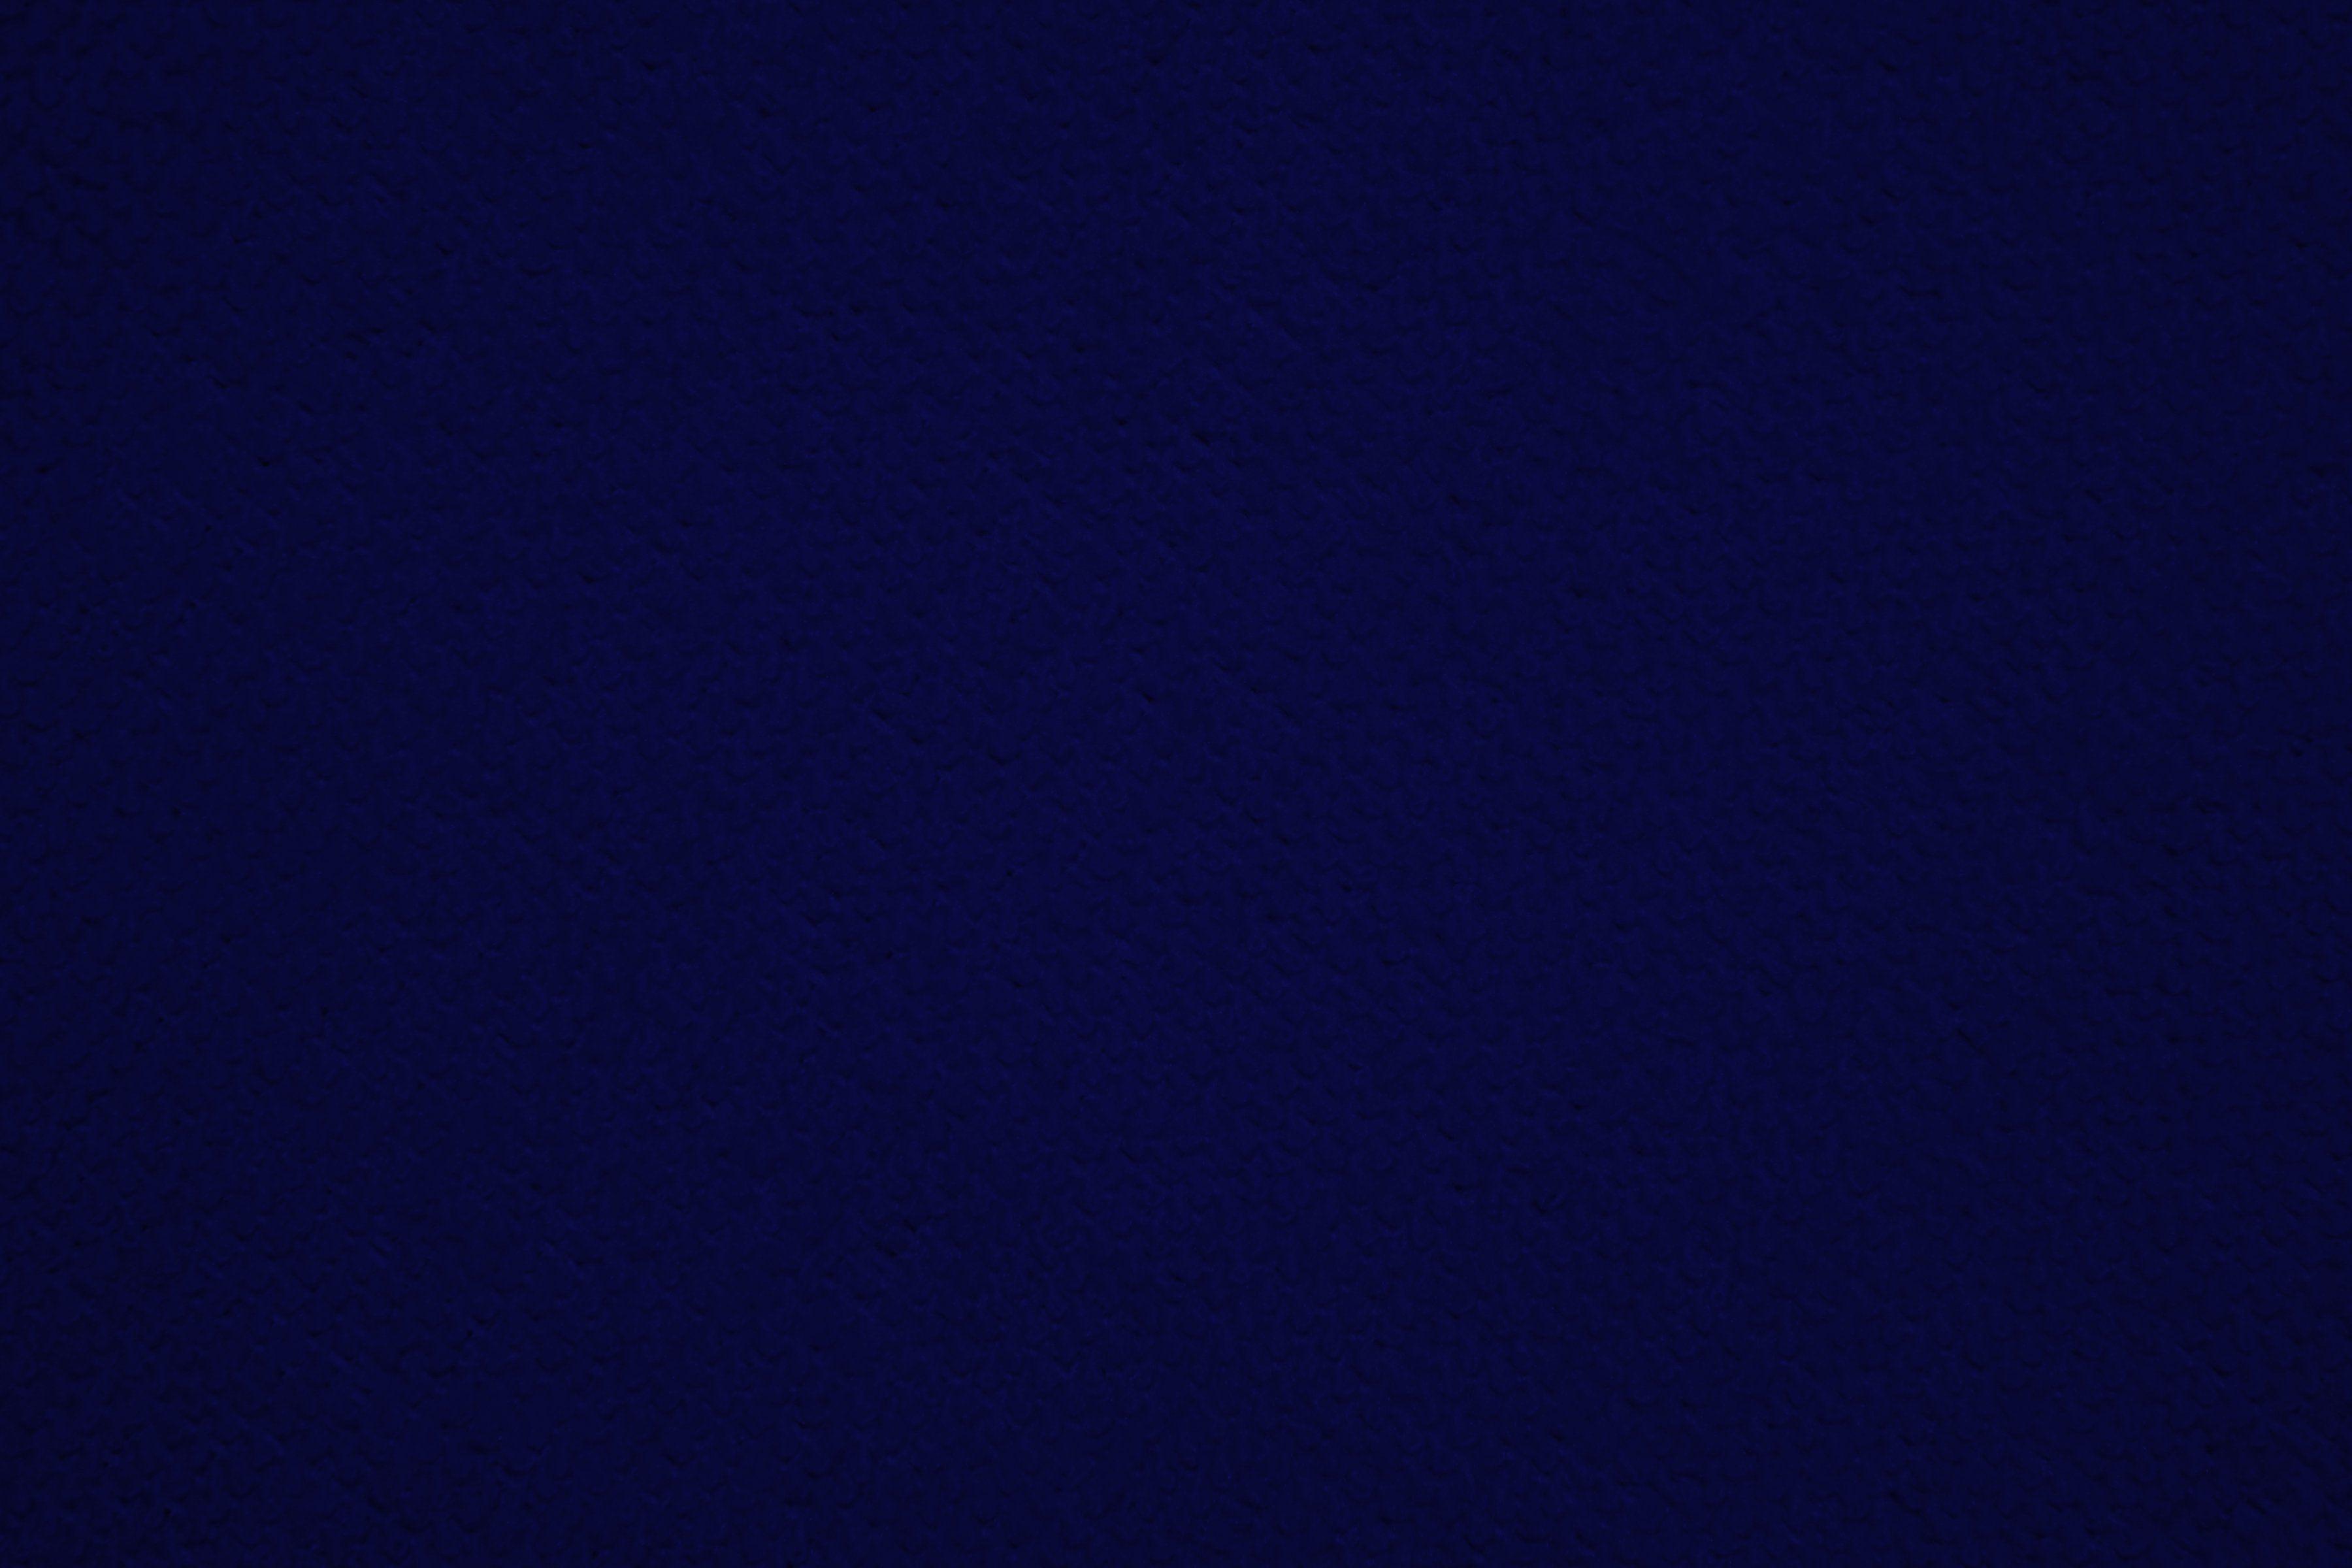 Navy Blue Backgrounds 3600x2400